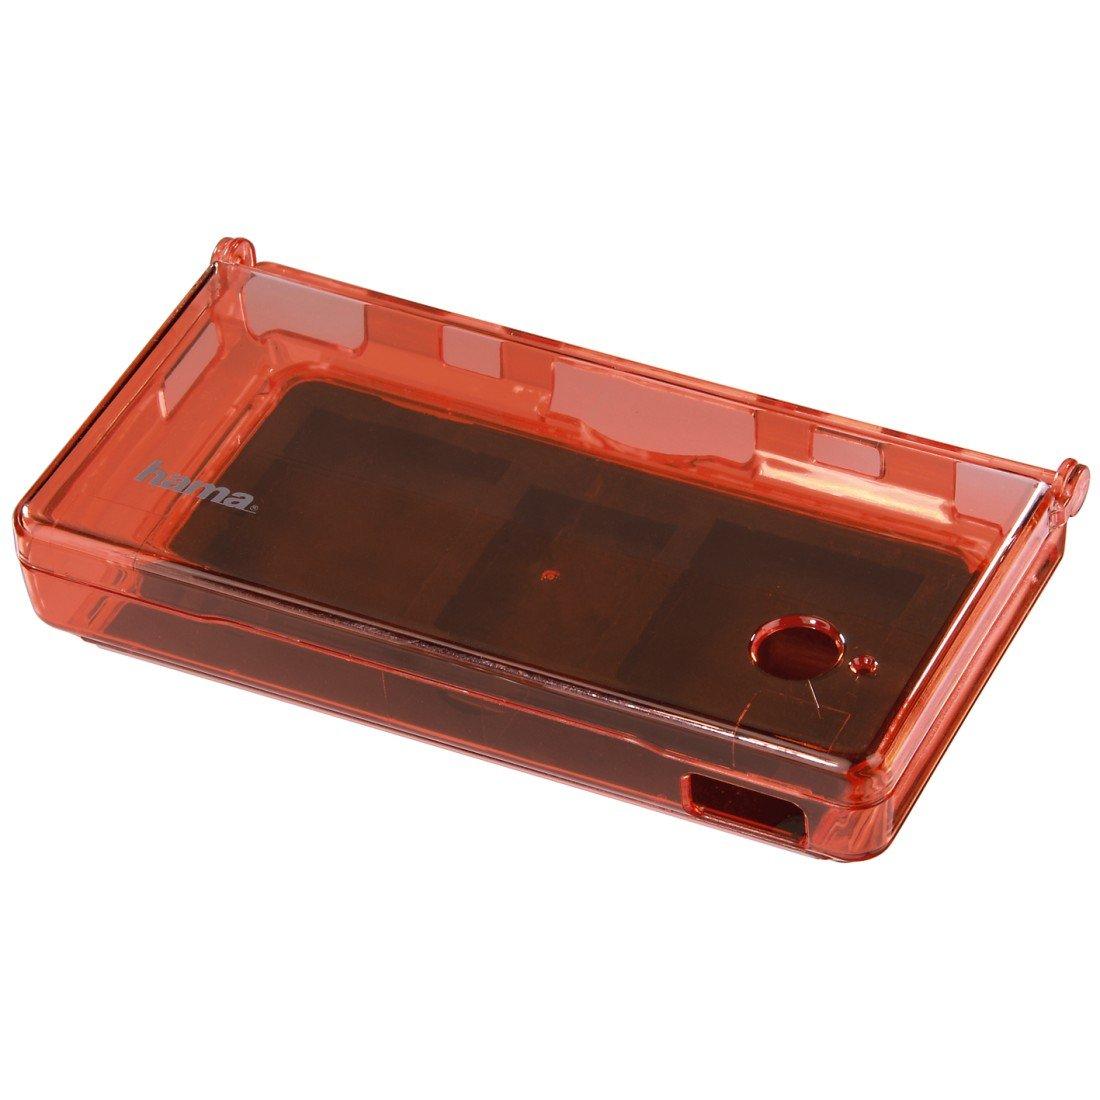 Hama Crystal Case for Nintendo DSi, transparent-red - cajas de ...